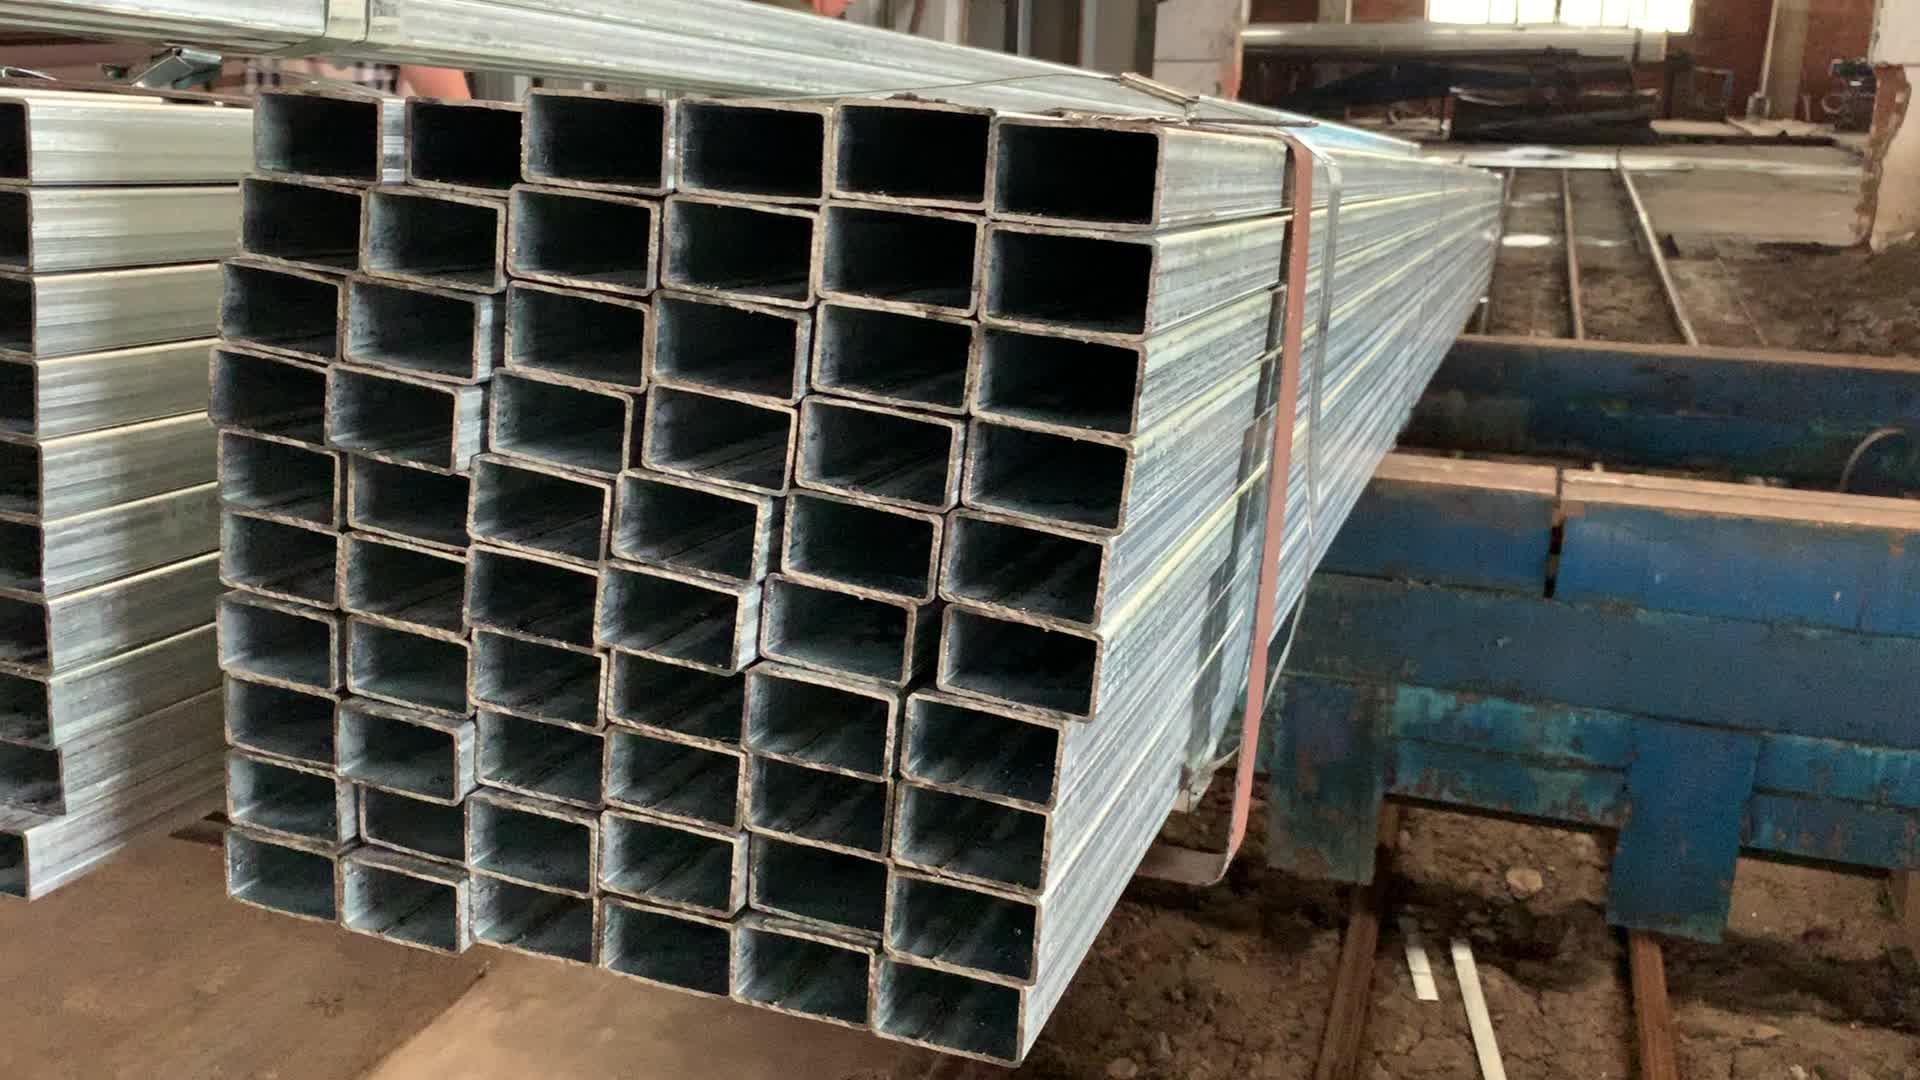 हल्के स्टील पाइप एसएई 1020 सहज स्टील पाइप तो ऐसी 1018 निर्बाध कार्बन स्टील पाइप आकार और मूल्य सूची